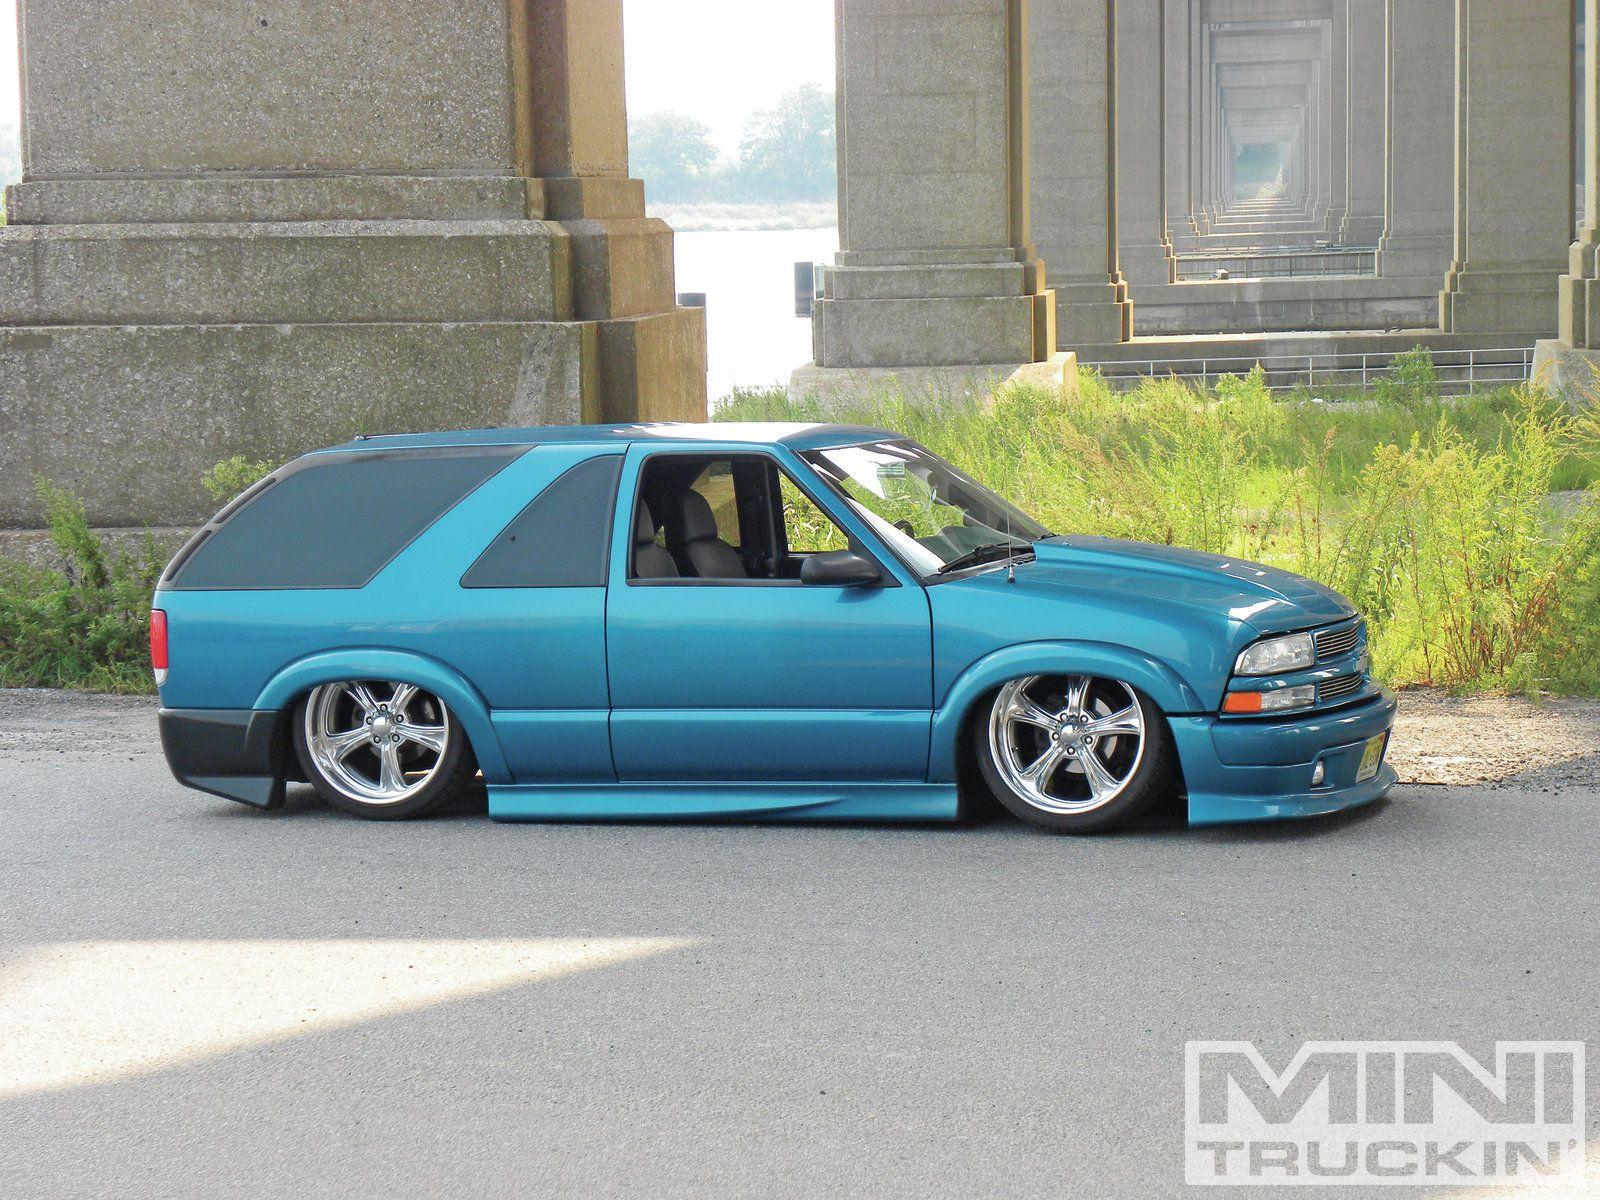 57 best BLAZERS images on Pinterest | Blazers, Chevrolet blazer ...